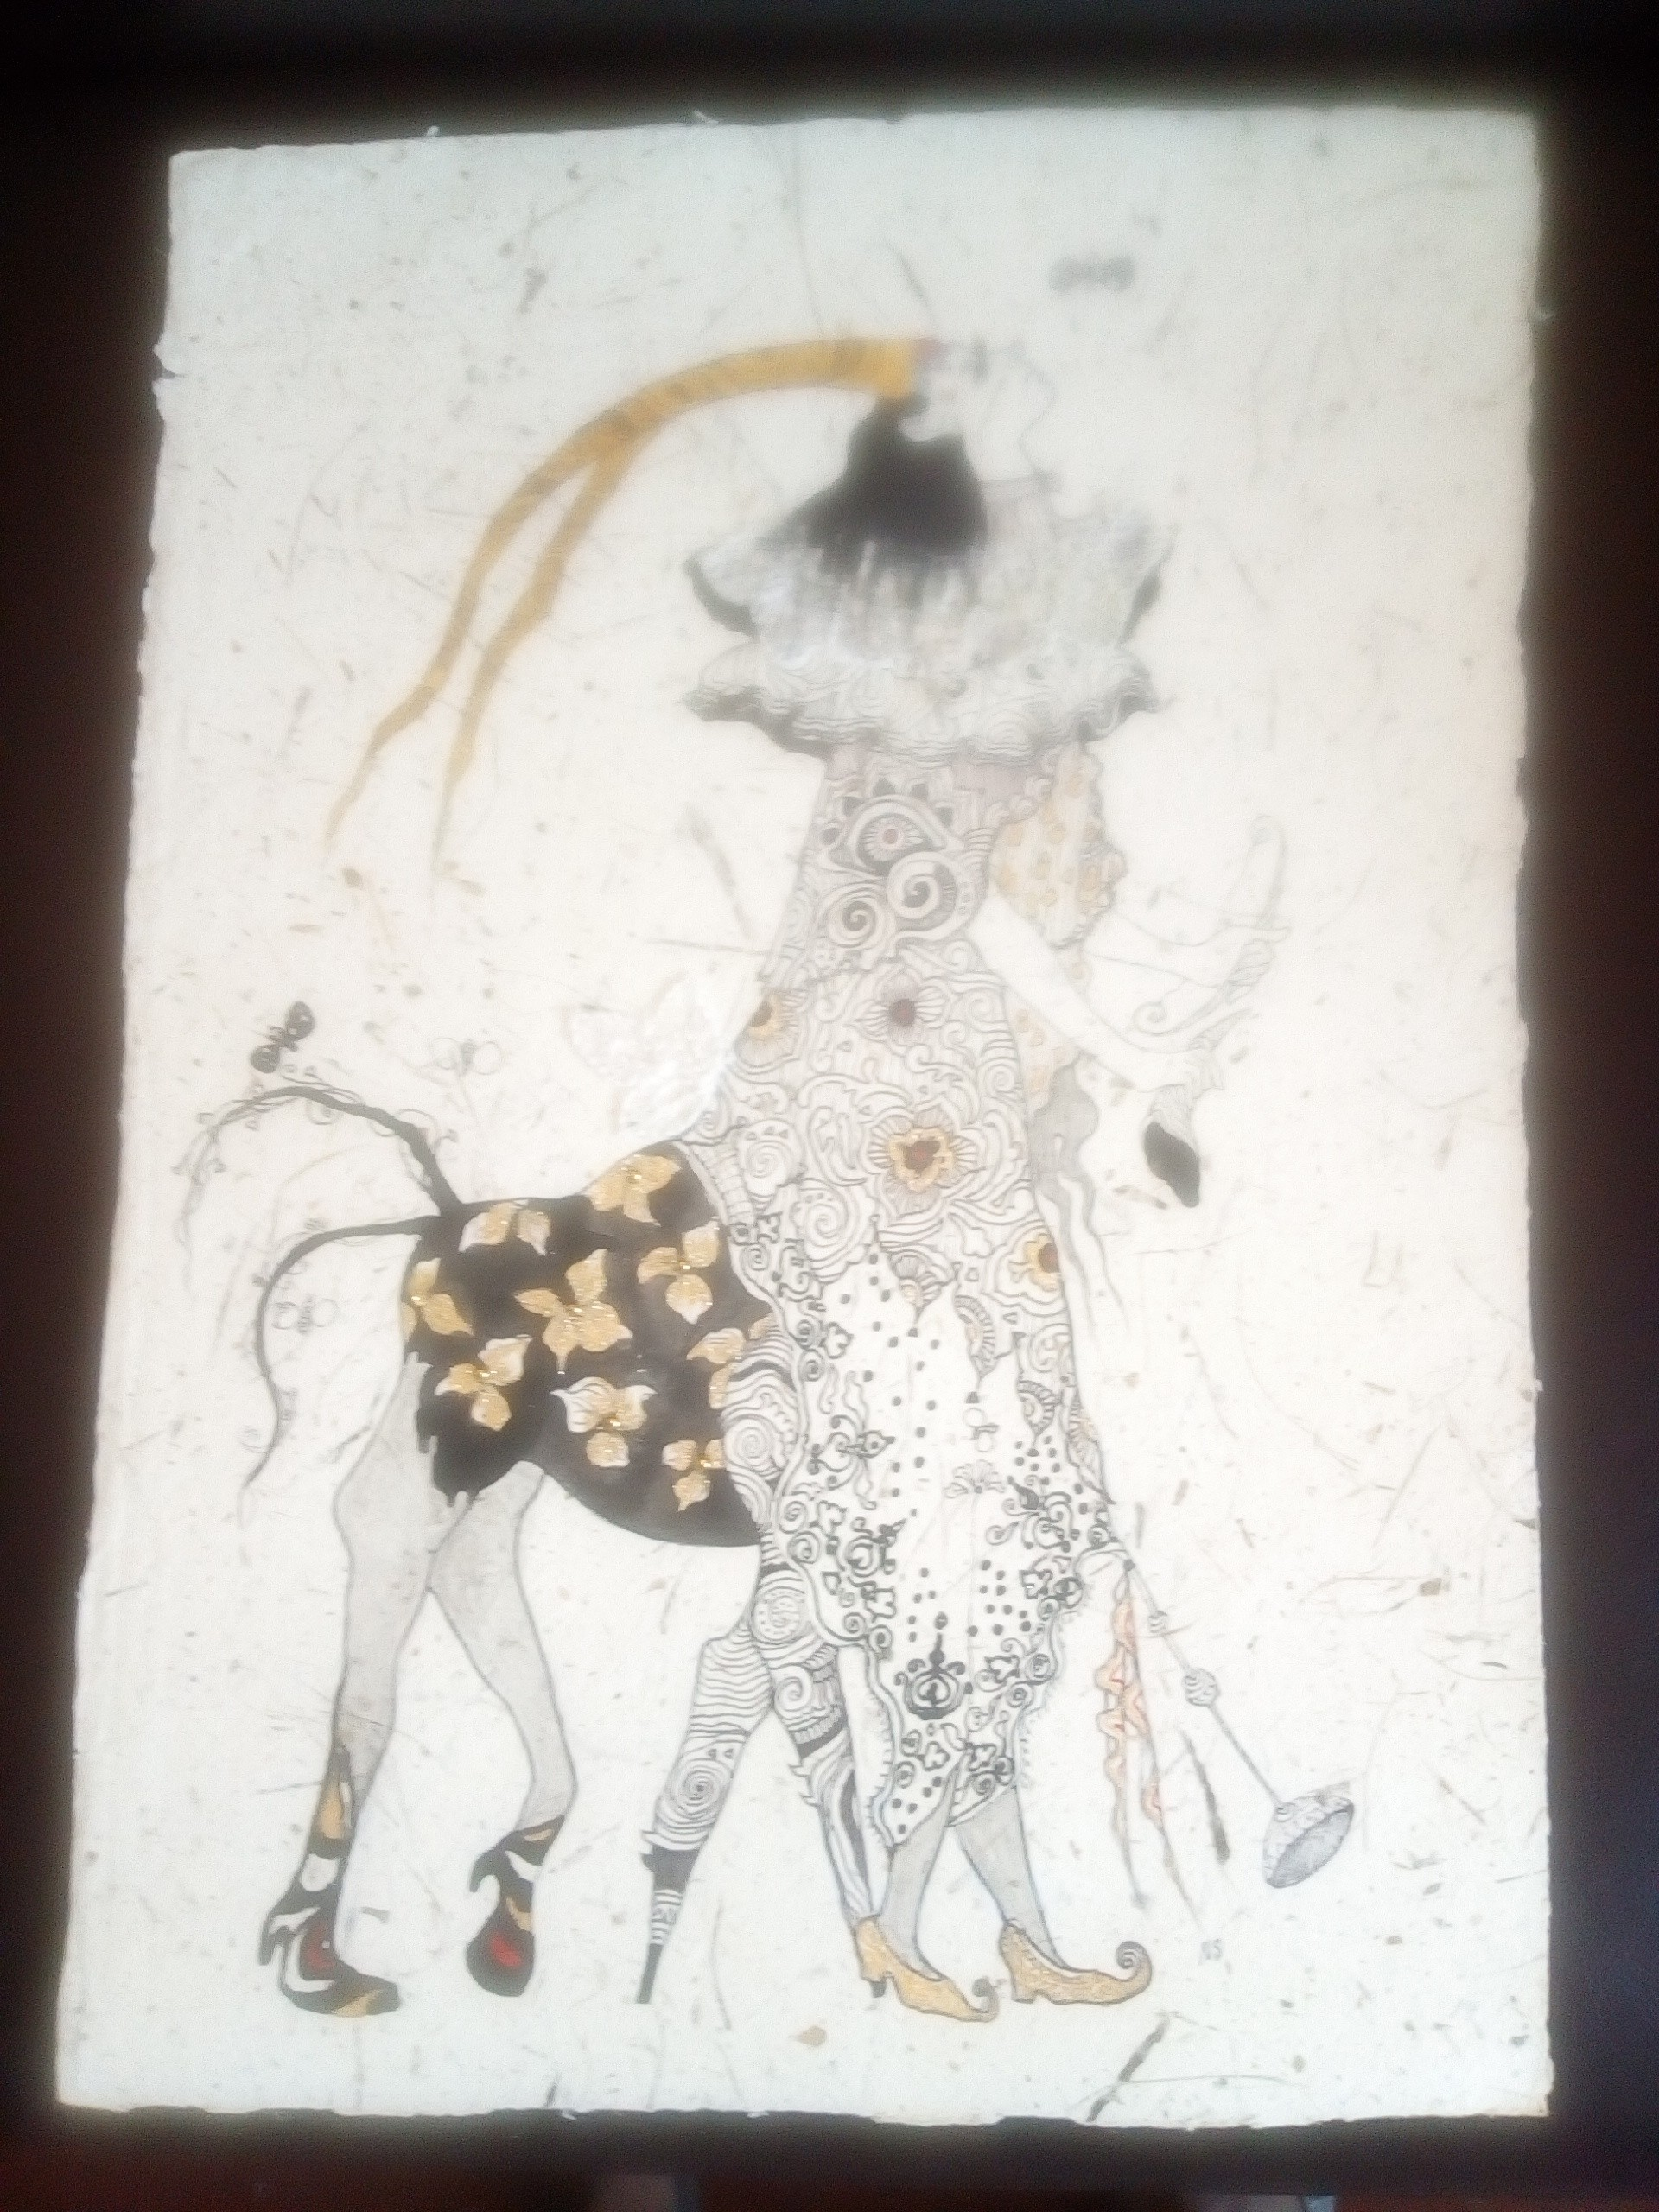 Greek god firon by Nihal Senarathna